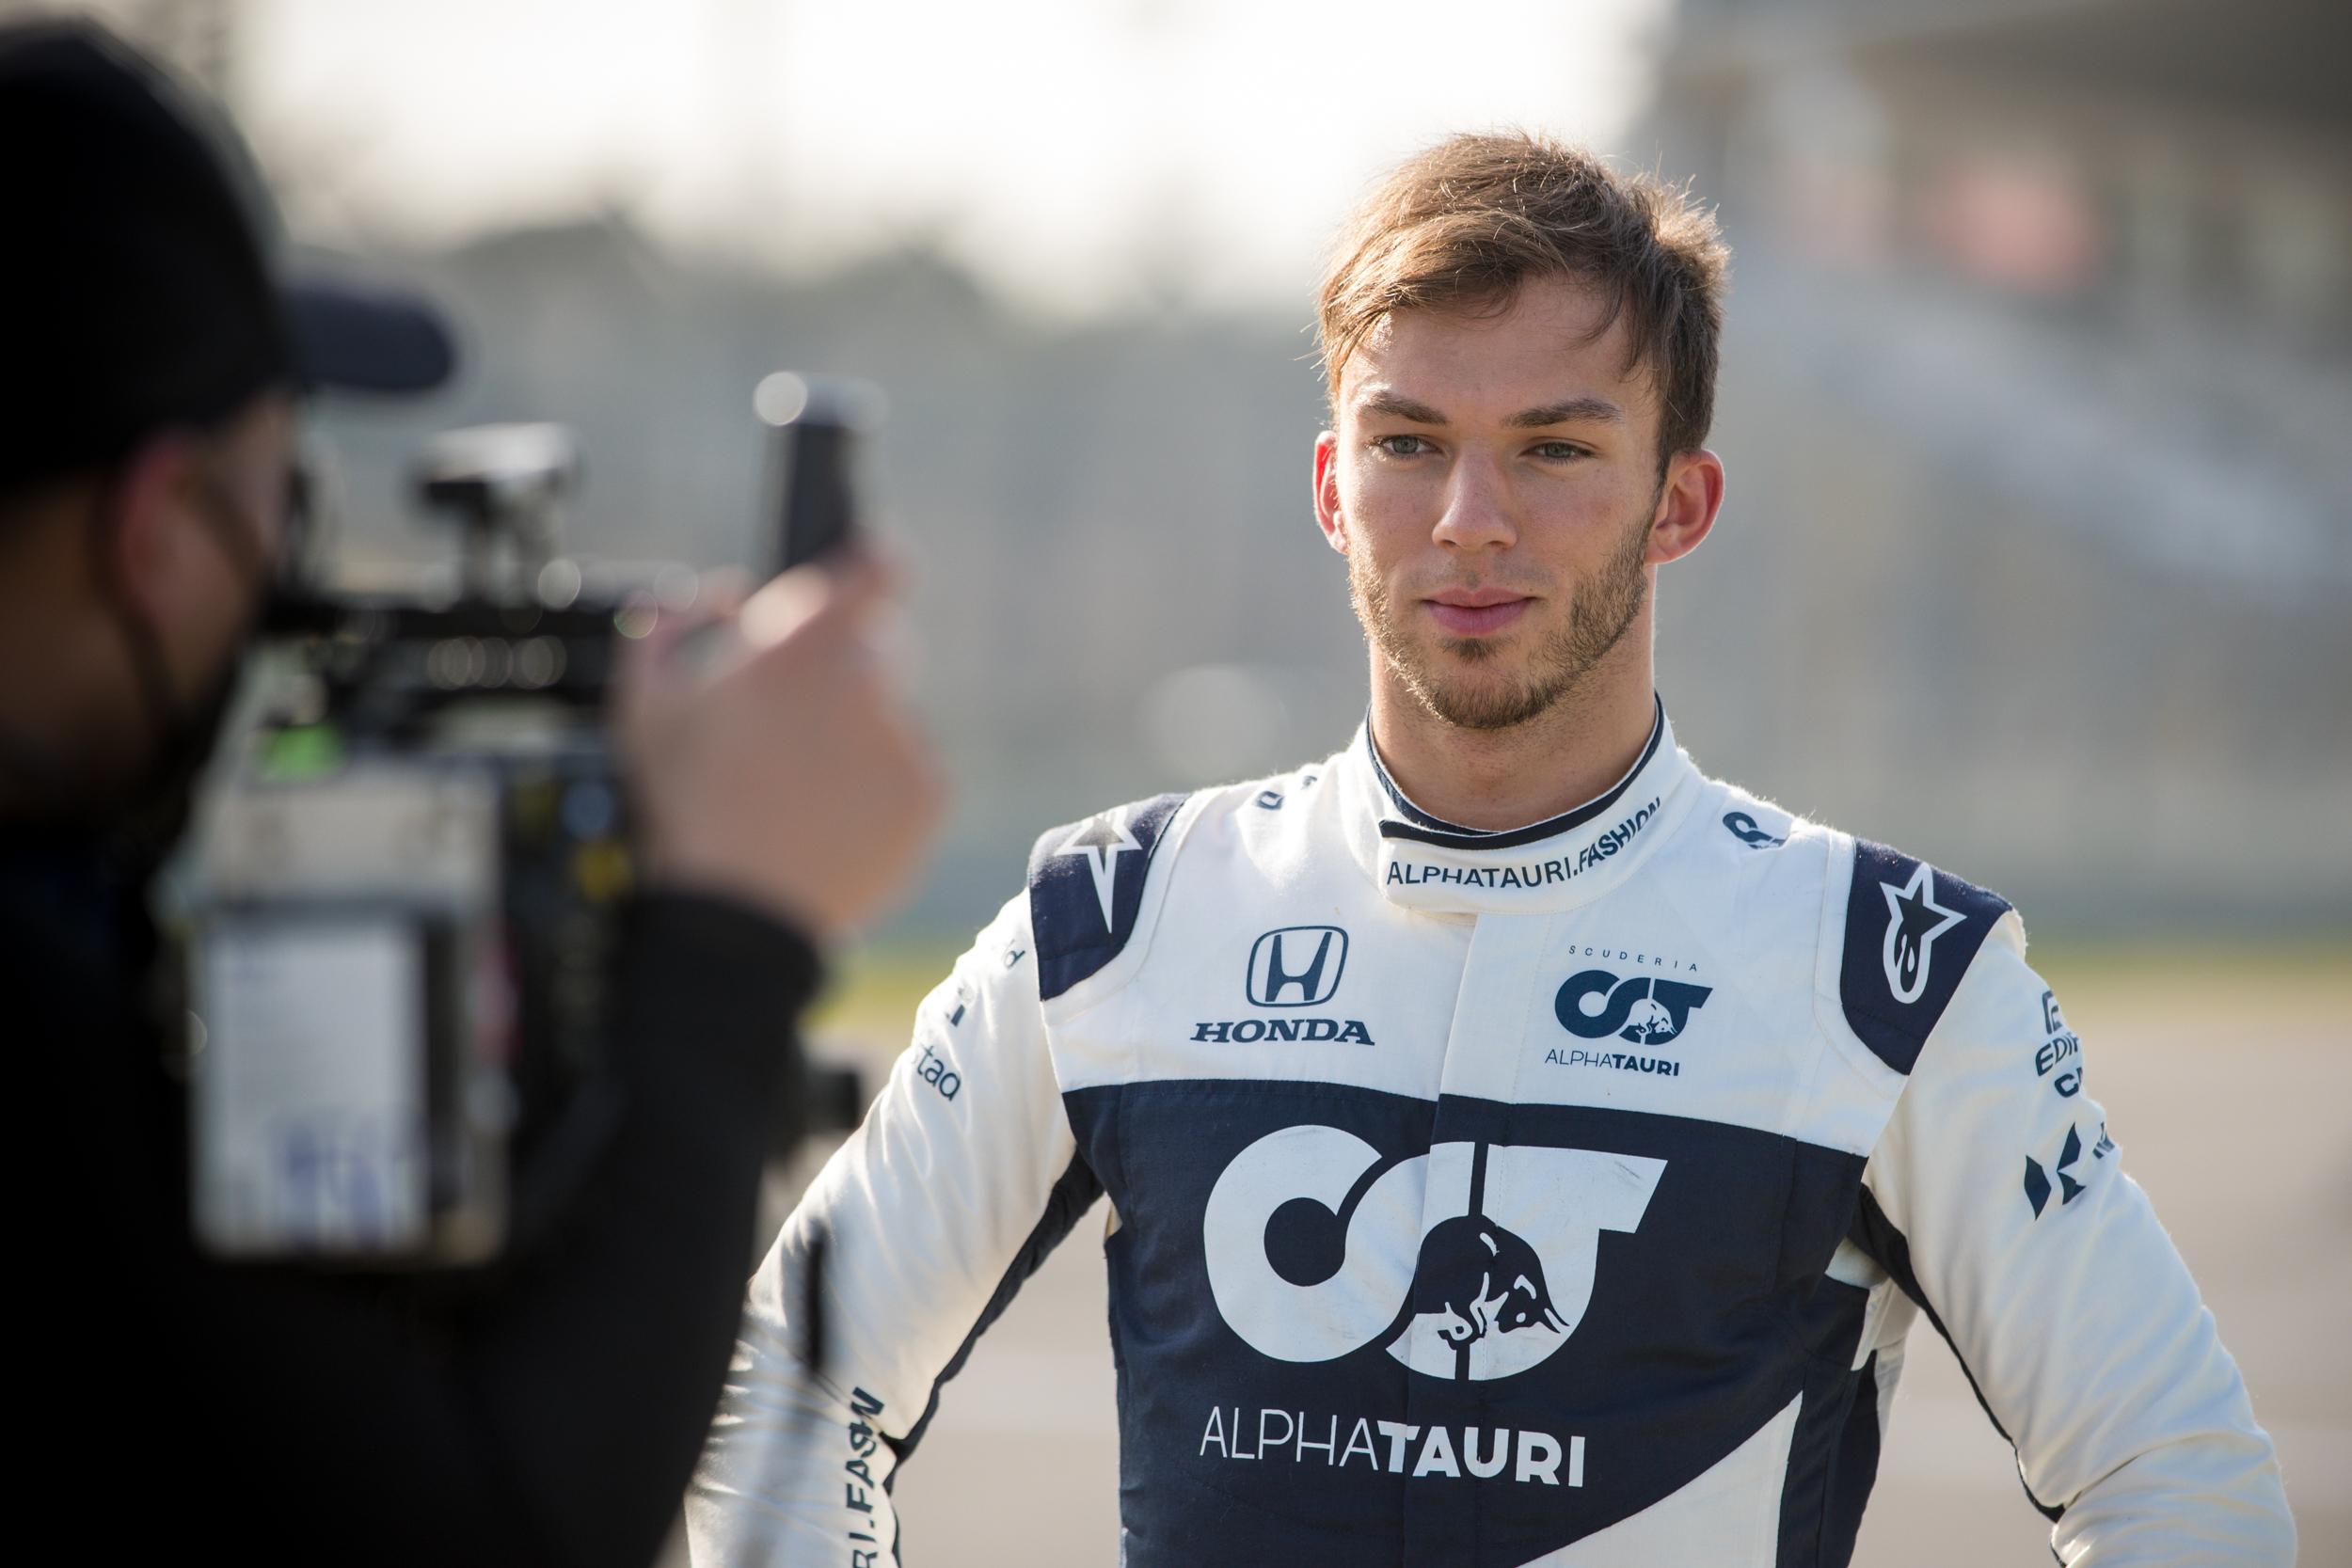 Phuong Herzer filming Pierre Gasly - Alpha Tauri F1 Shakedown 2021